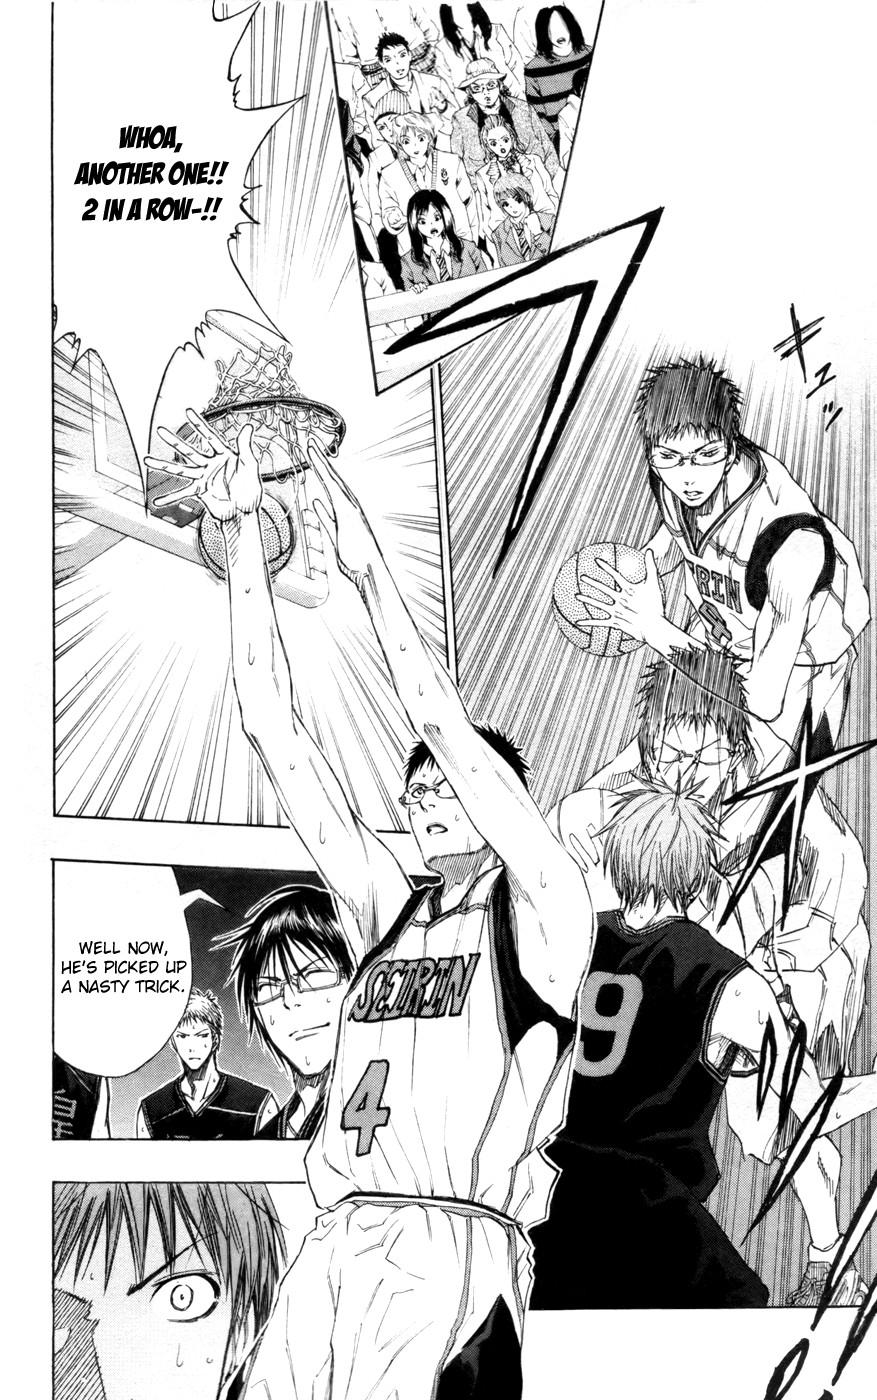 Kuroko no Basket Manga Chapter 118 - Image 4_008